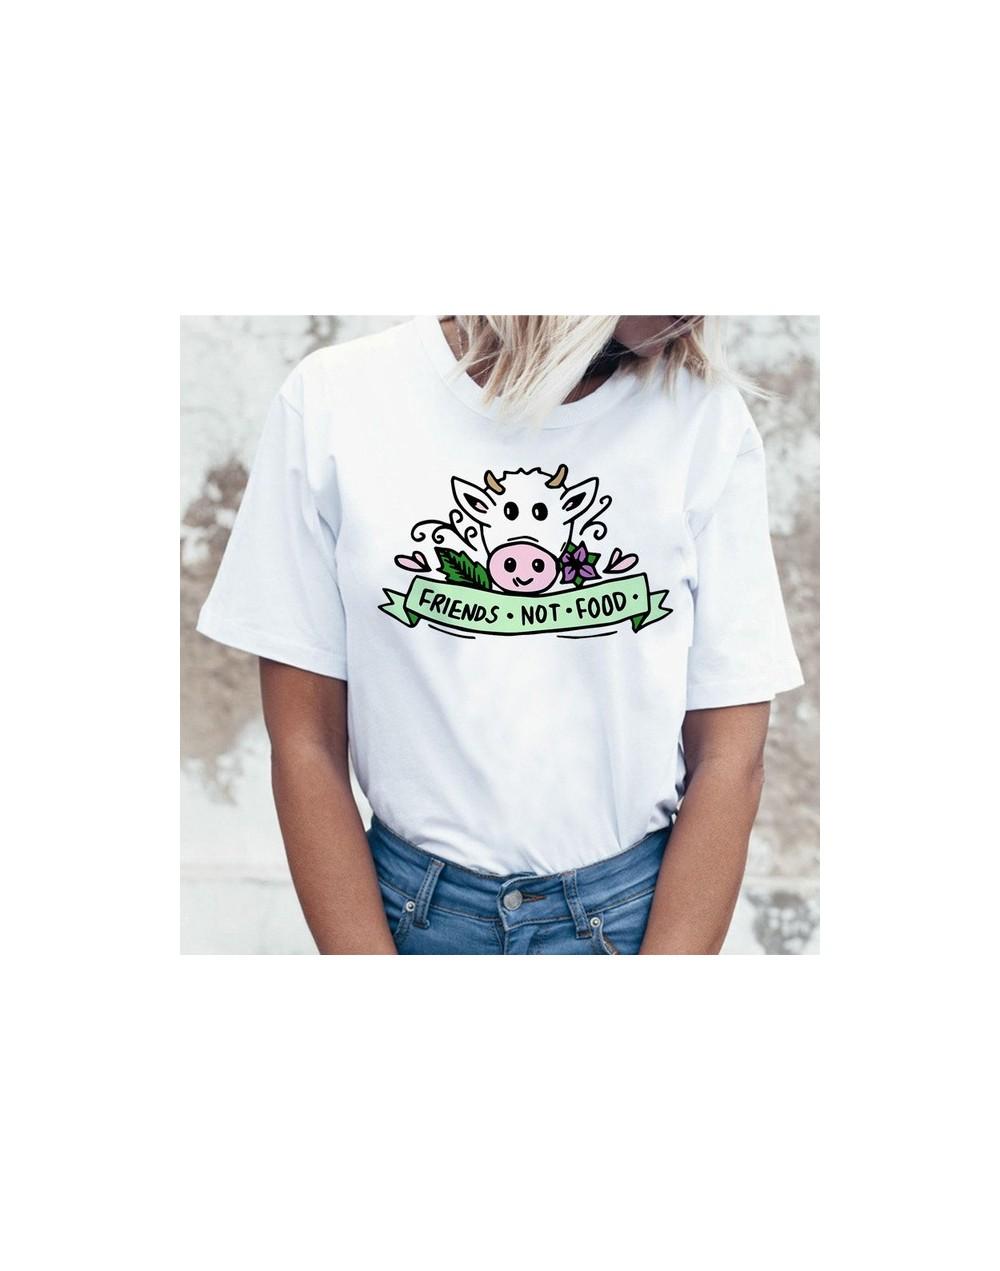 vegan Save The Bees t shirt women t-shirt tshirt women graphic top tee shirts korean kawaii harajuku 2019 ulzzang new female...